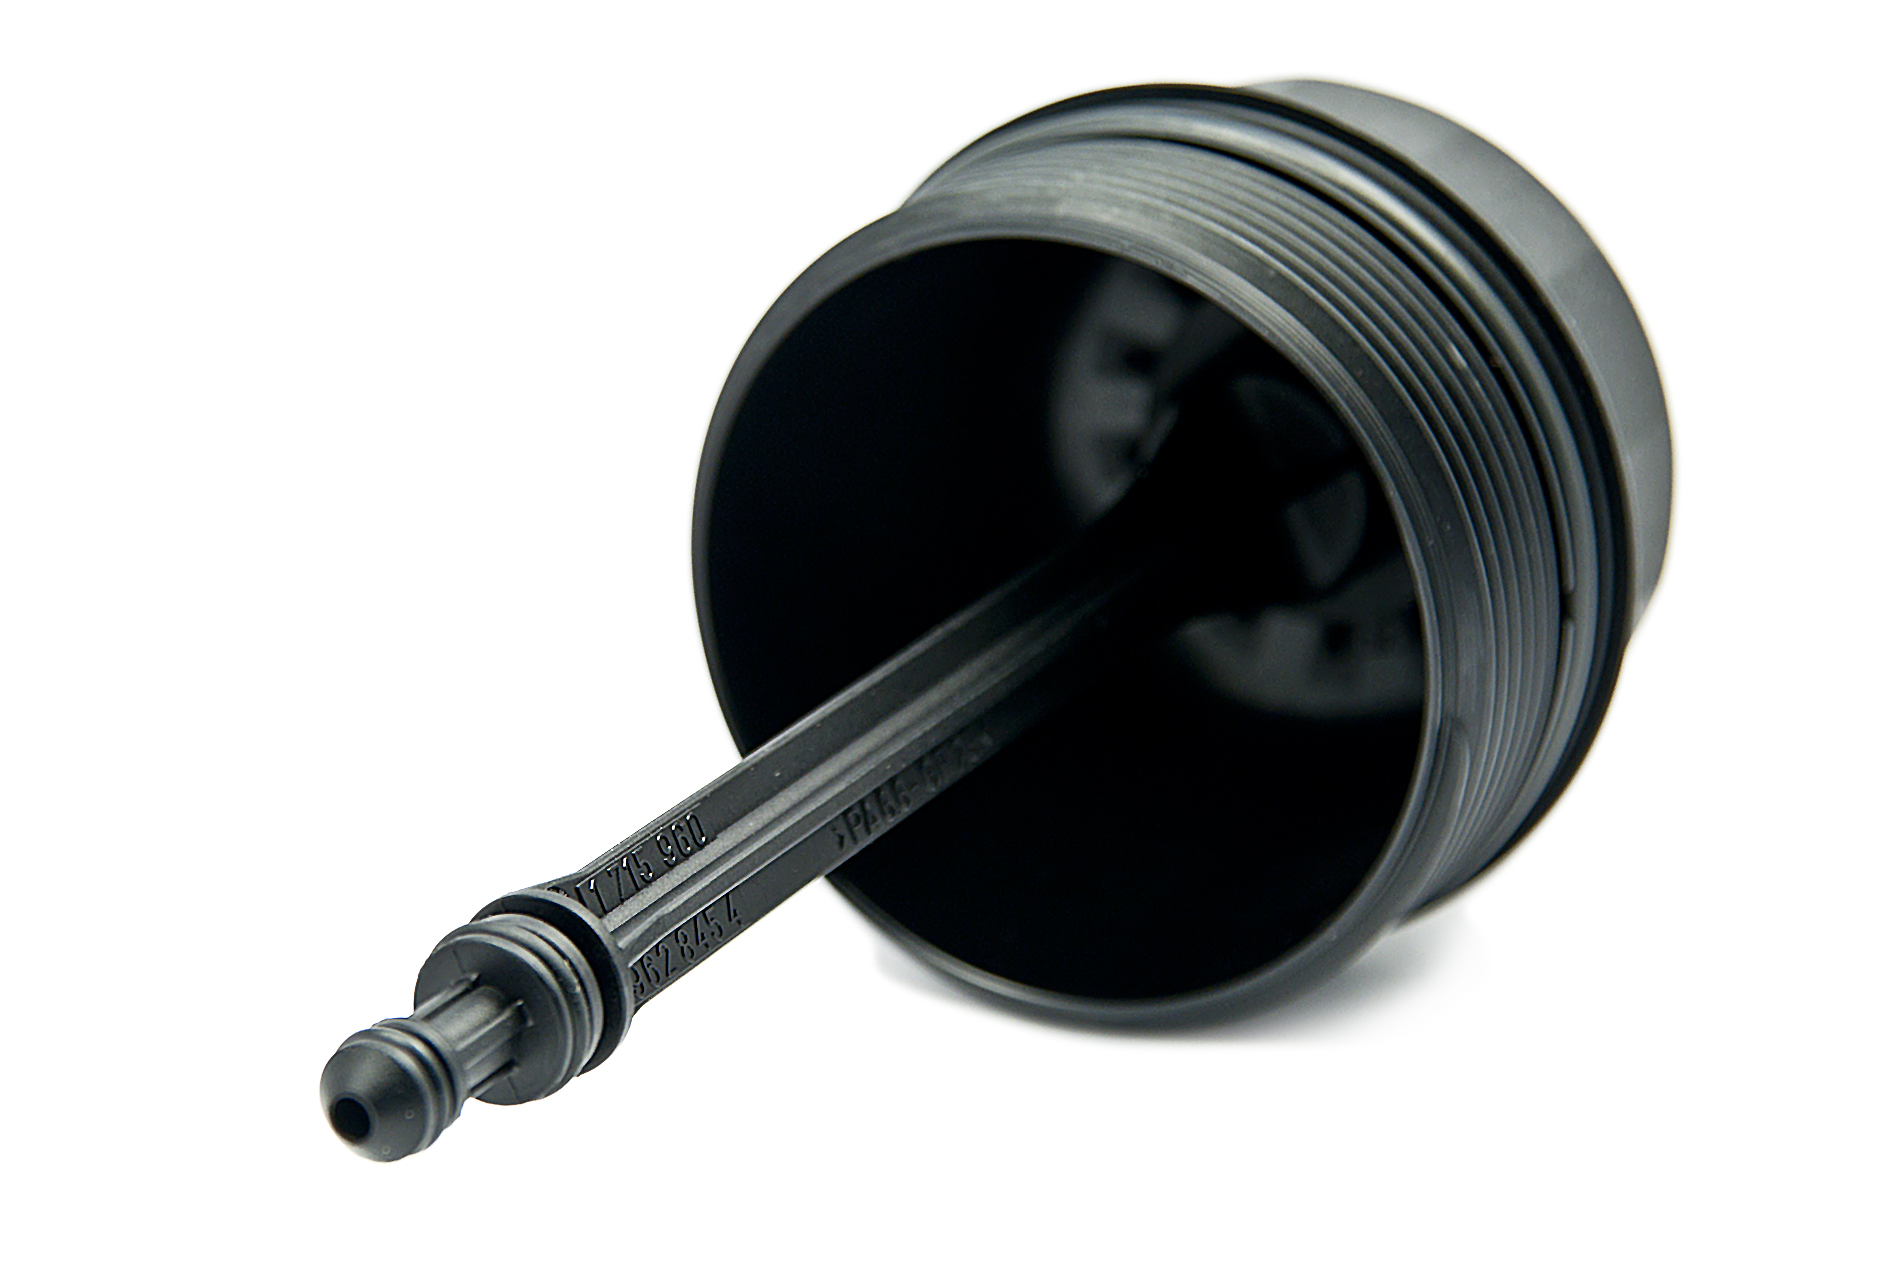 Bmw Genuine Oil Filter Cover E36 E46 Z3 3 Series 11421715960 Ebay